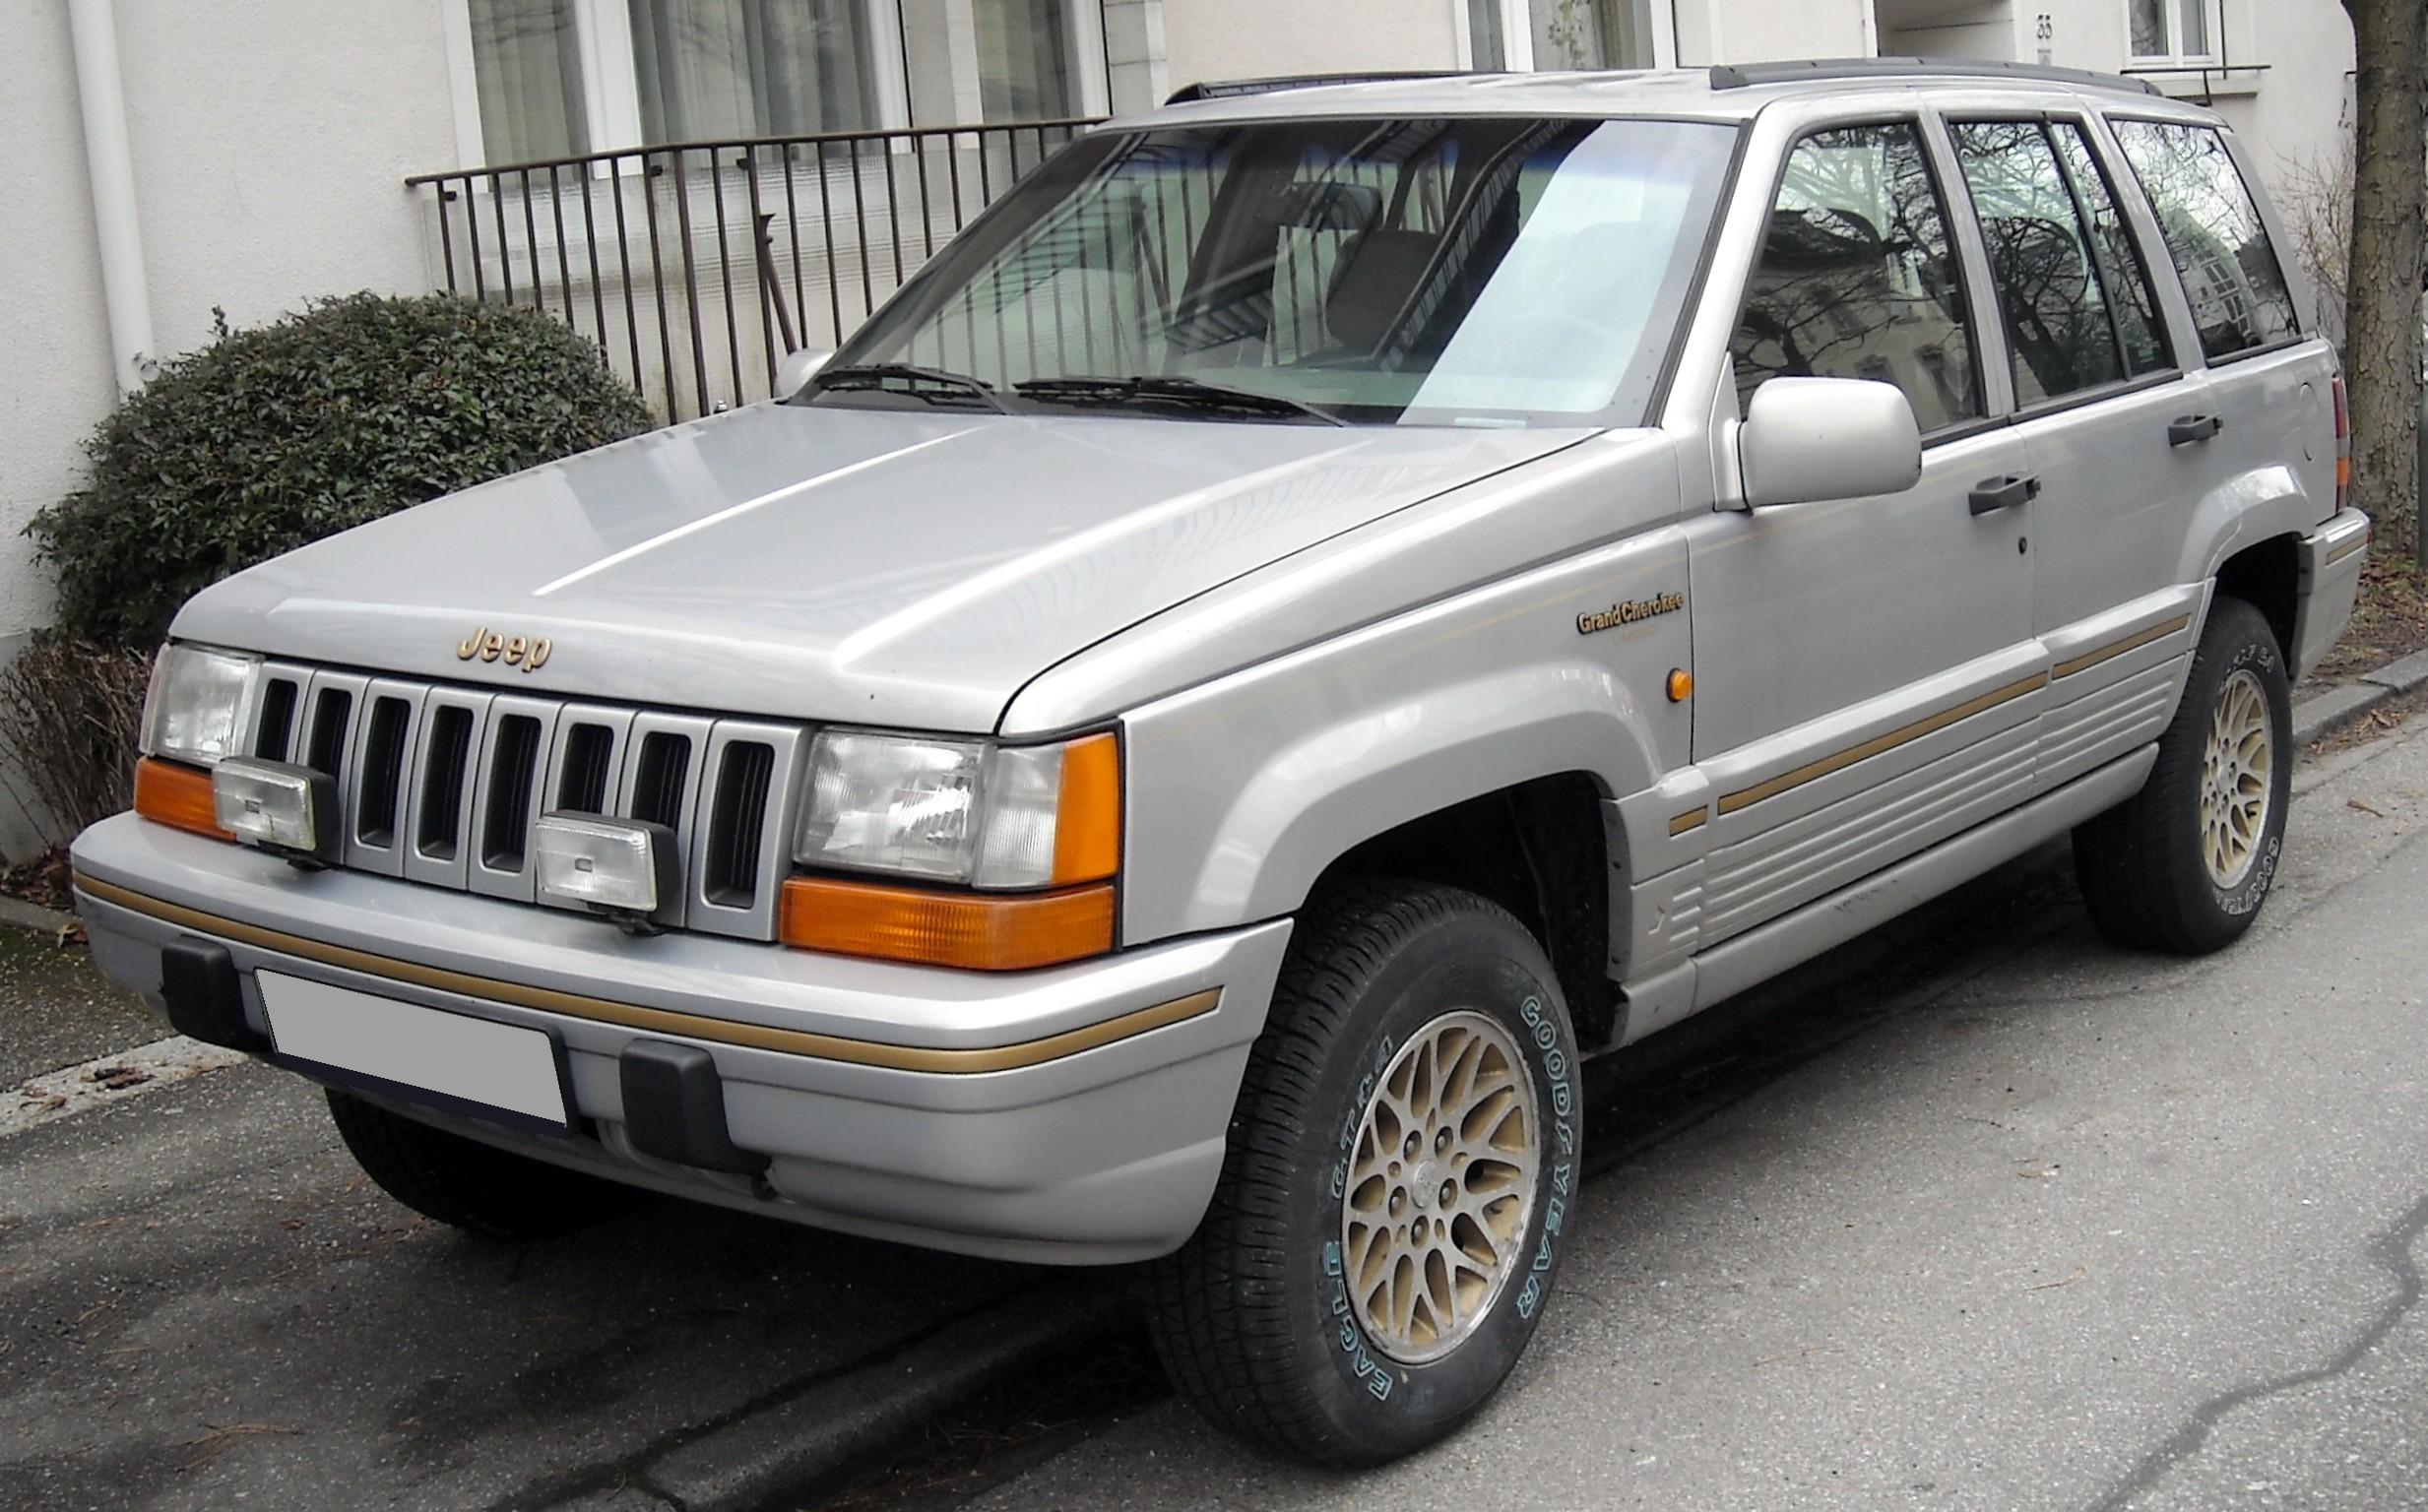 File:Jeep Grand Cherokee ZJ front 20090121.jpg - Wikimedia Commons